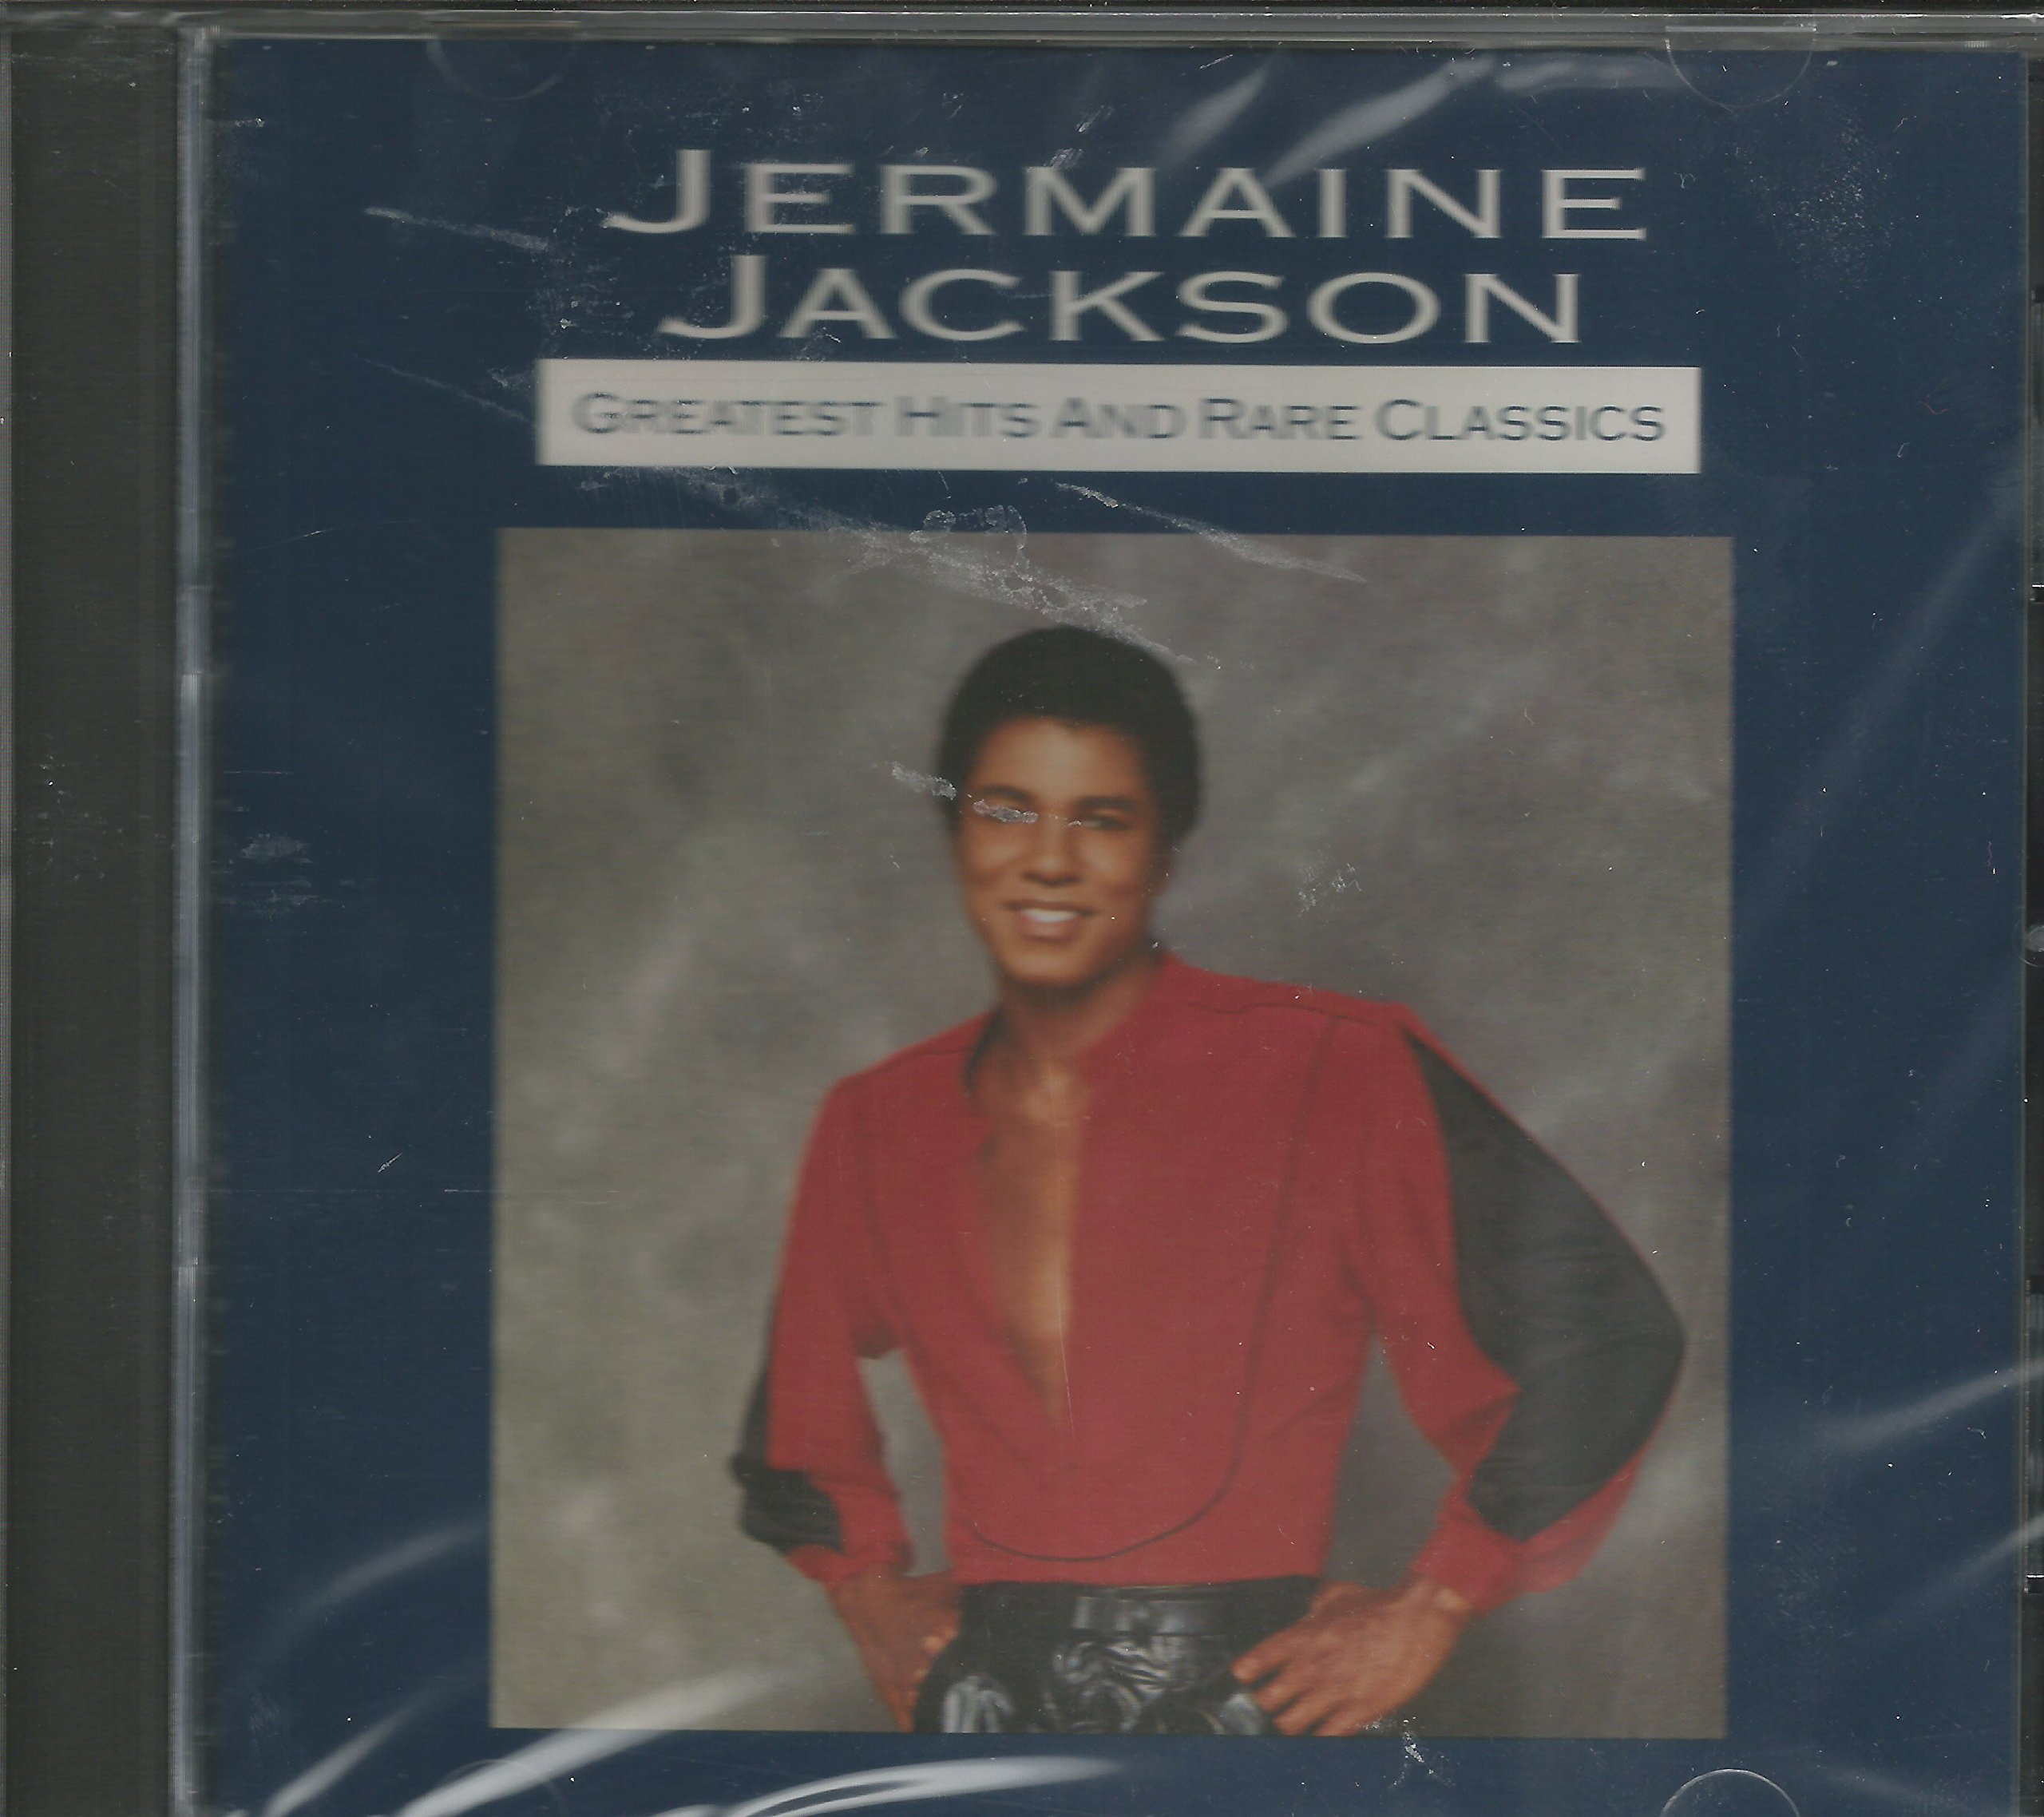 Jermaine Jackson: Greatest Hits & Rare Classics